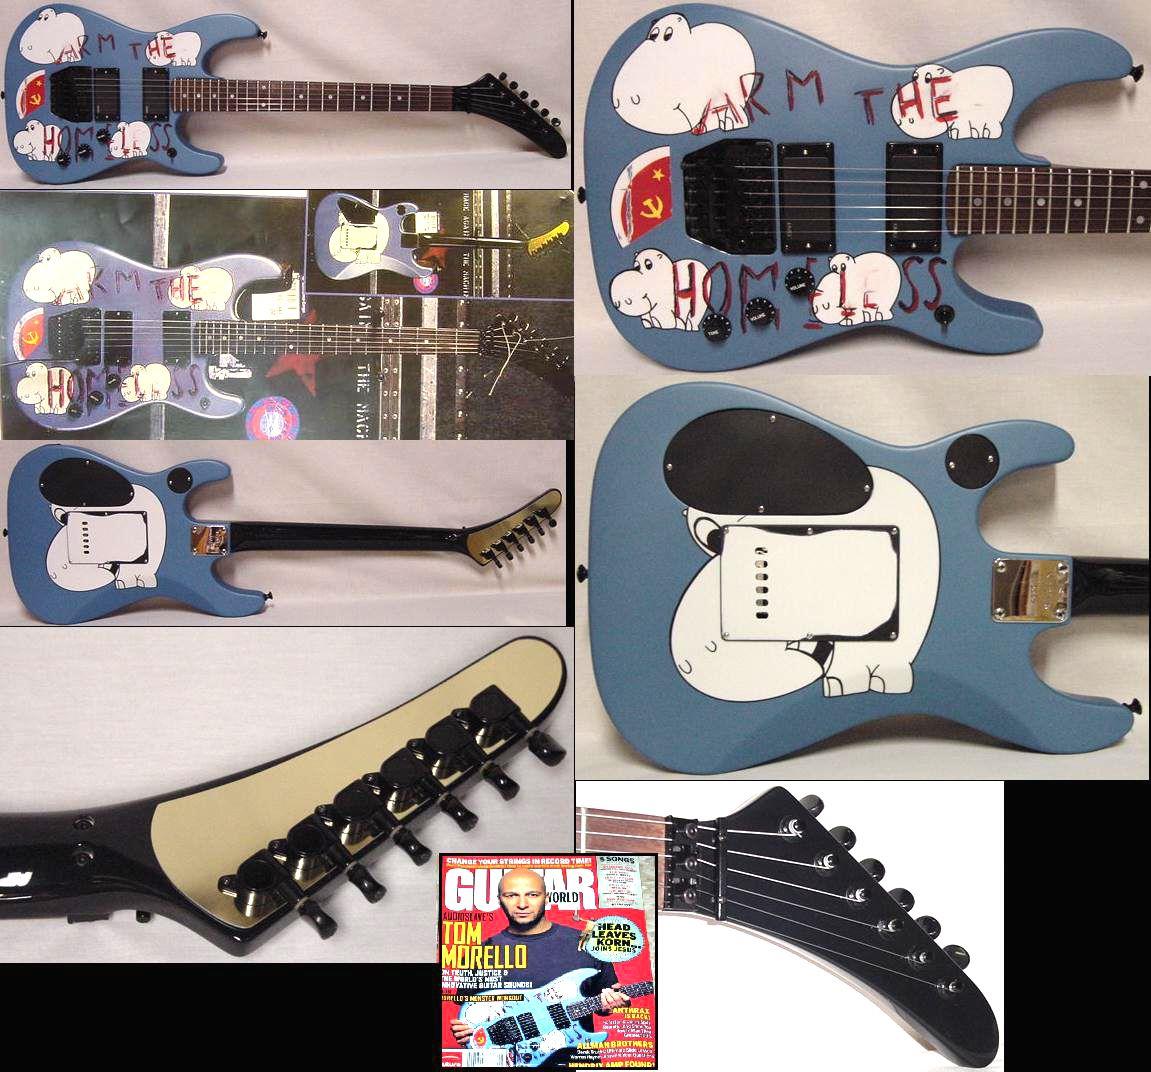 Tom Morello And Hippos Il A Ete Elu Pour La 4 E Fois Consecutive Meilleur Guitariste Au Tom Morello Good Music Custom Build